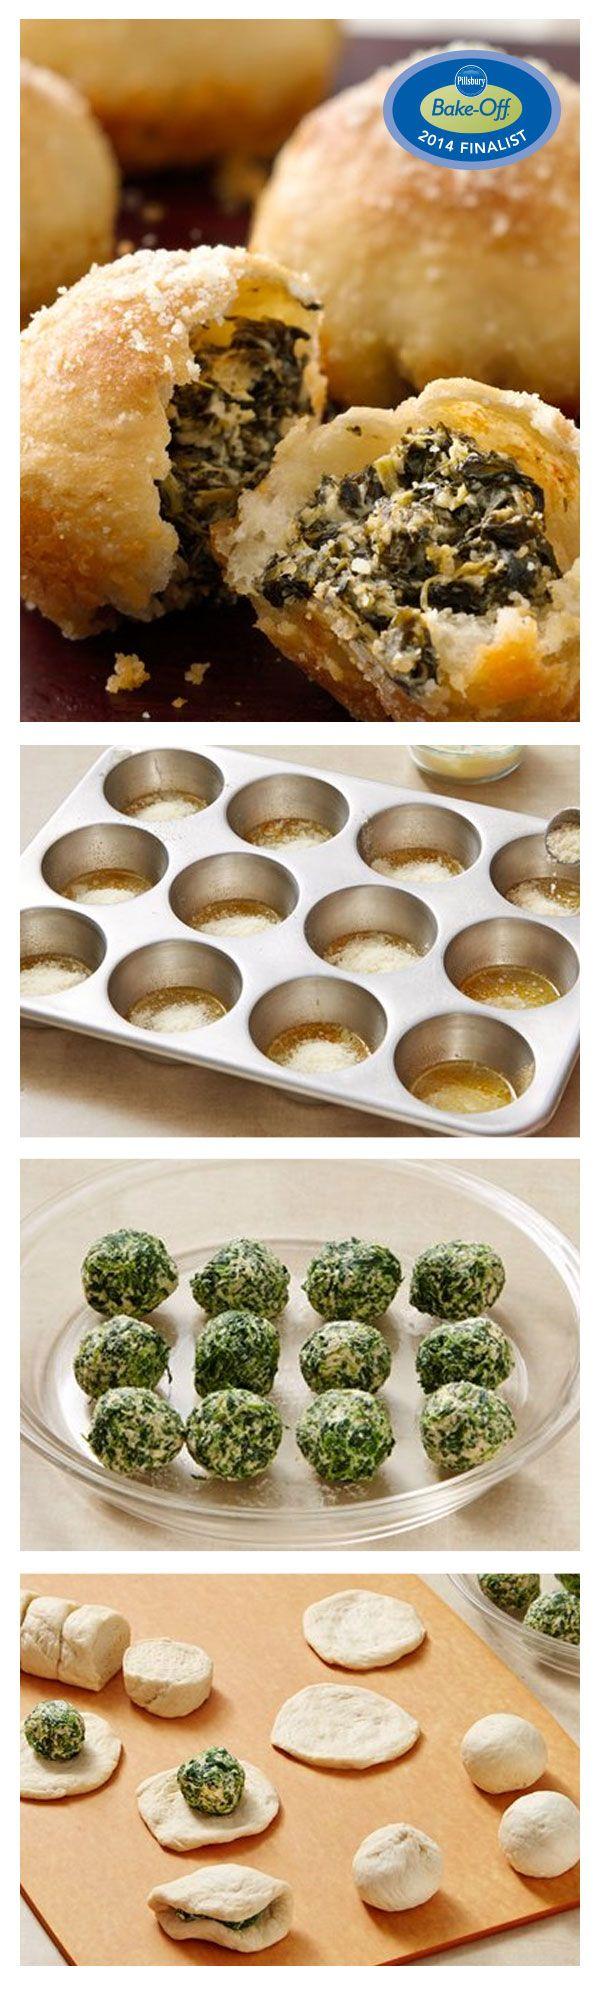 Spinach Dip-Stuffed Garlic Rolls by Marie Valdes from Brandon, FL